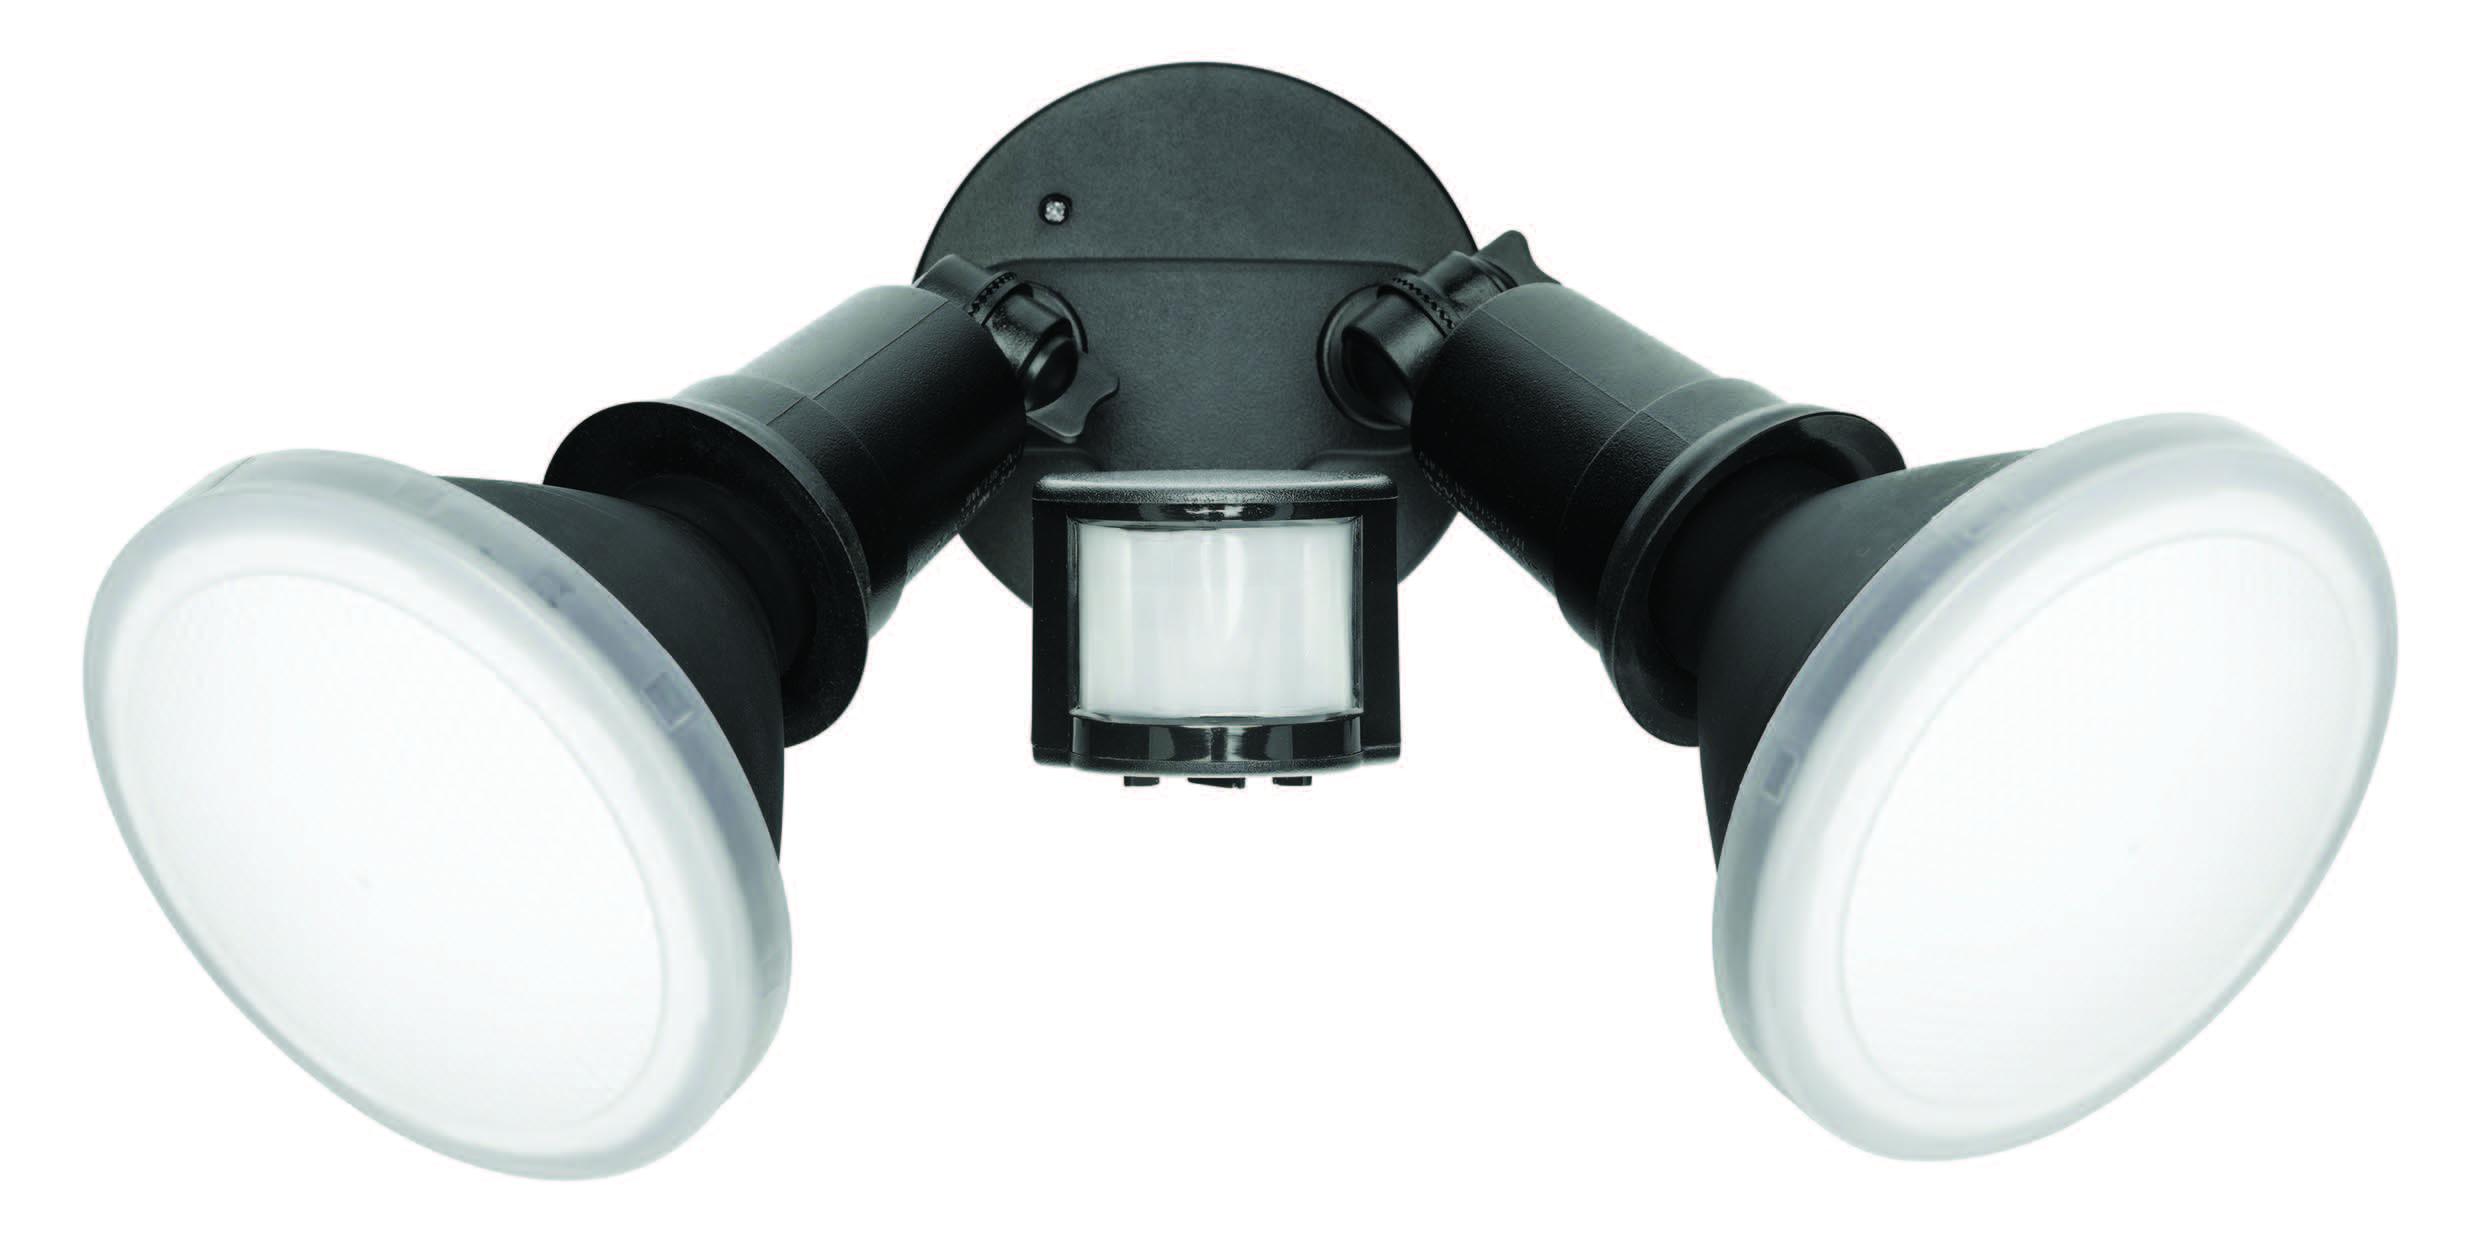 Sl1222 Par38 Led Security Light With Sensor Twin Head